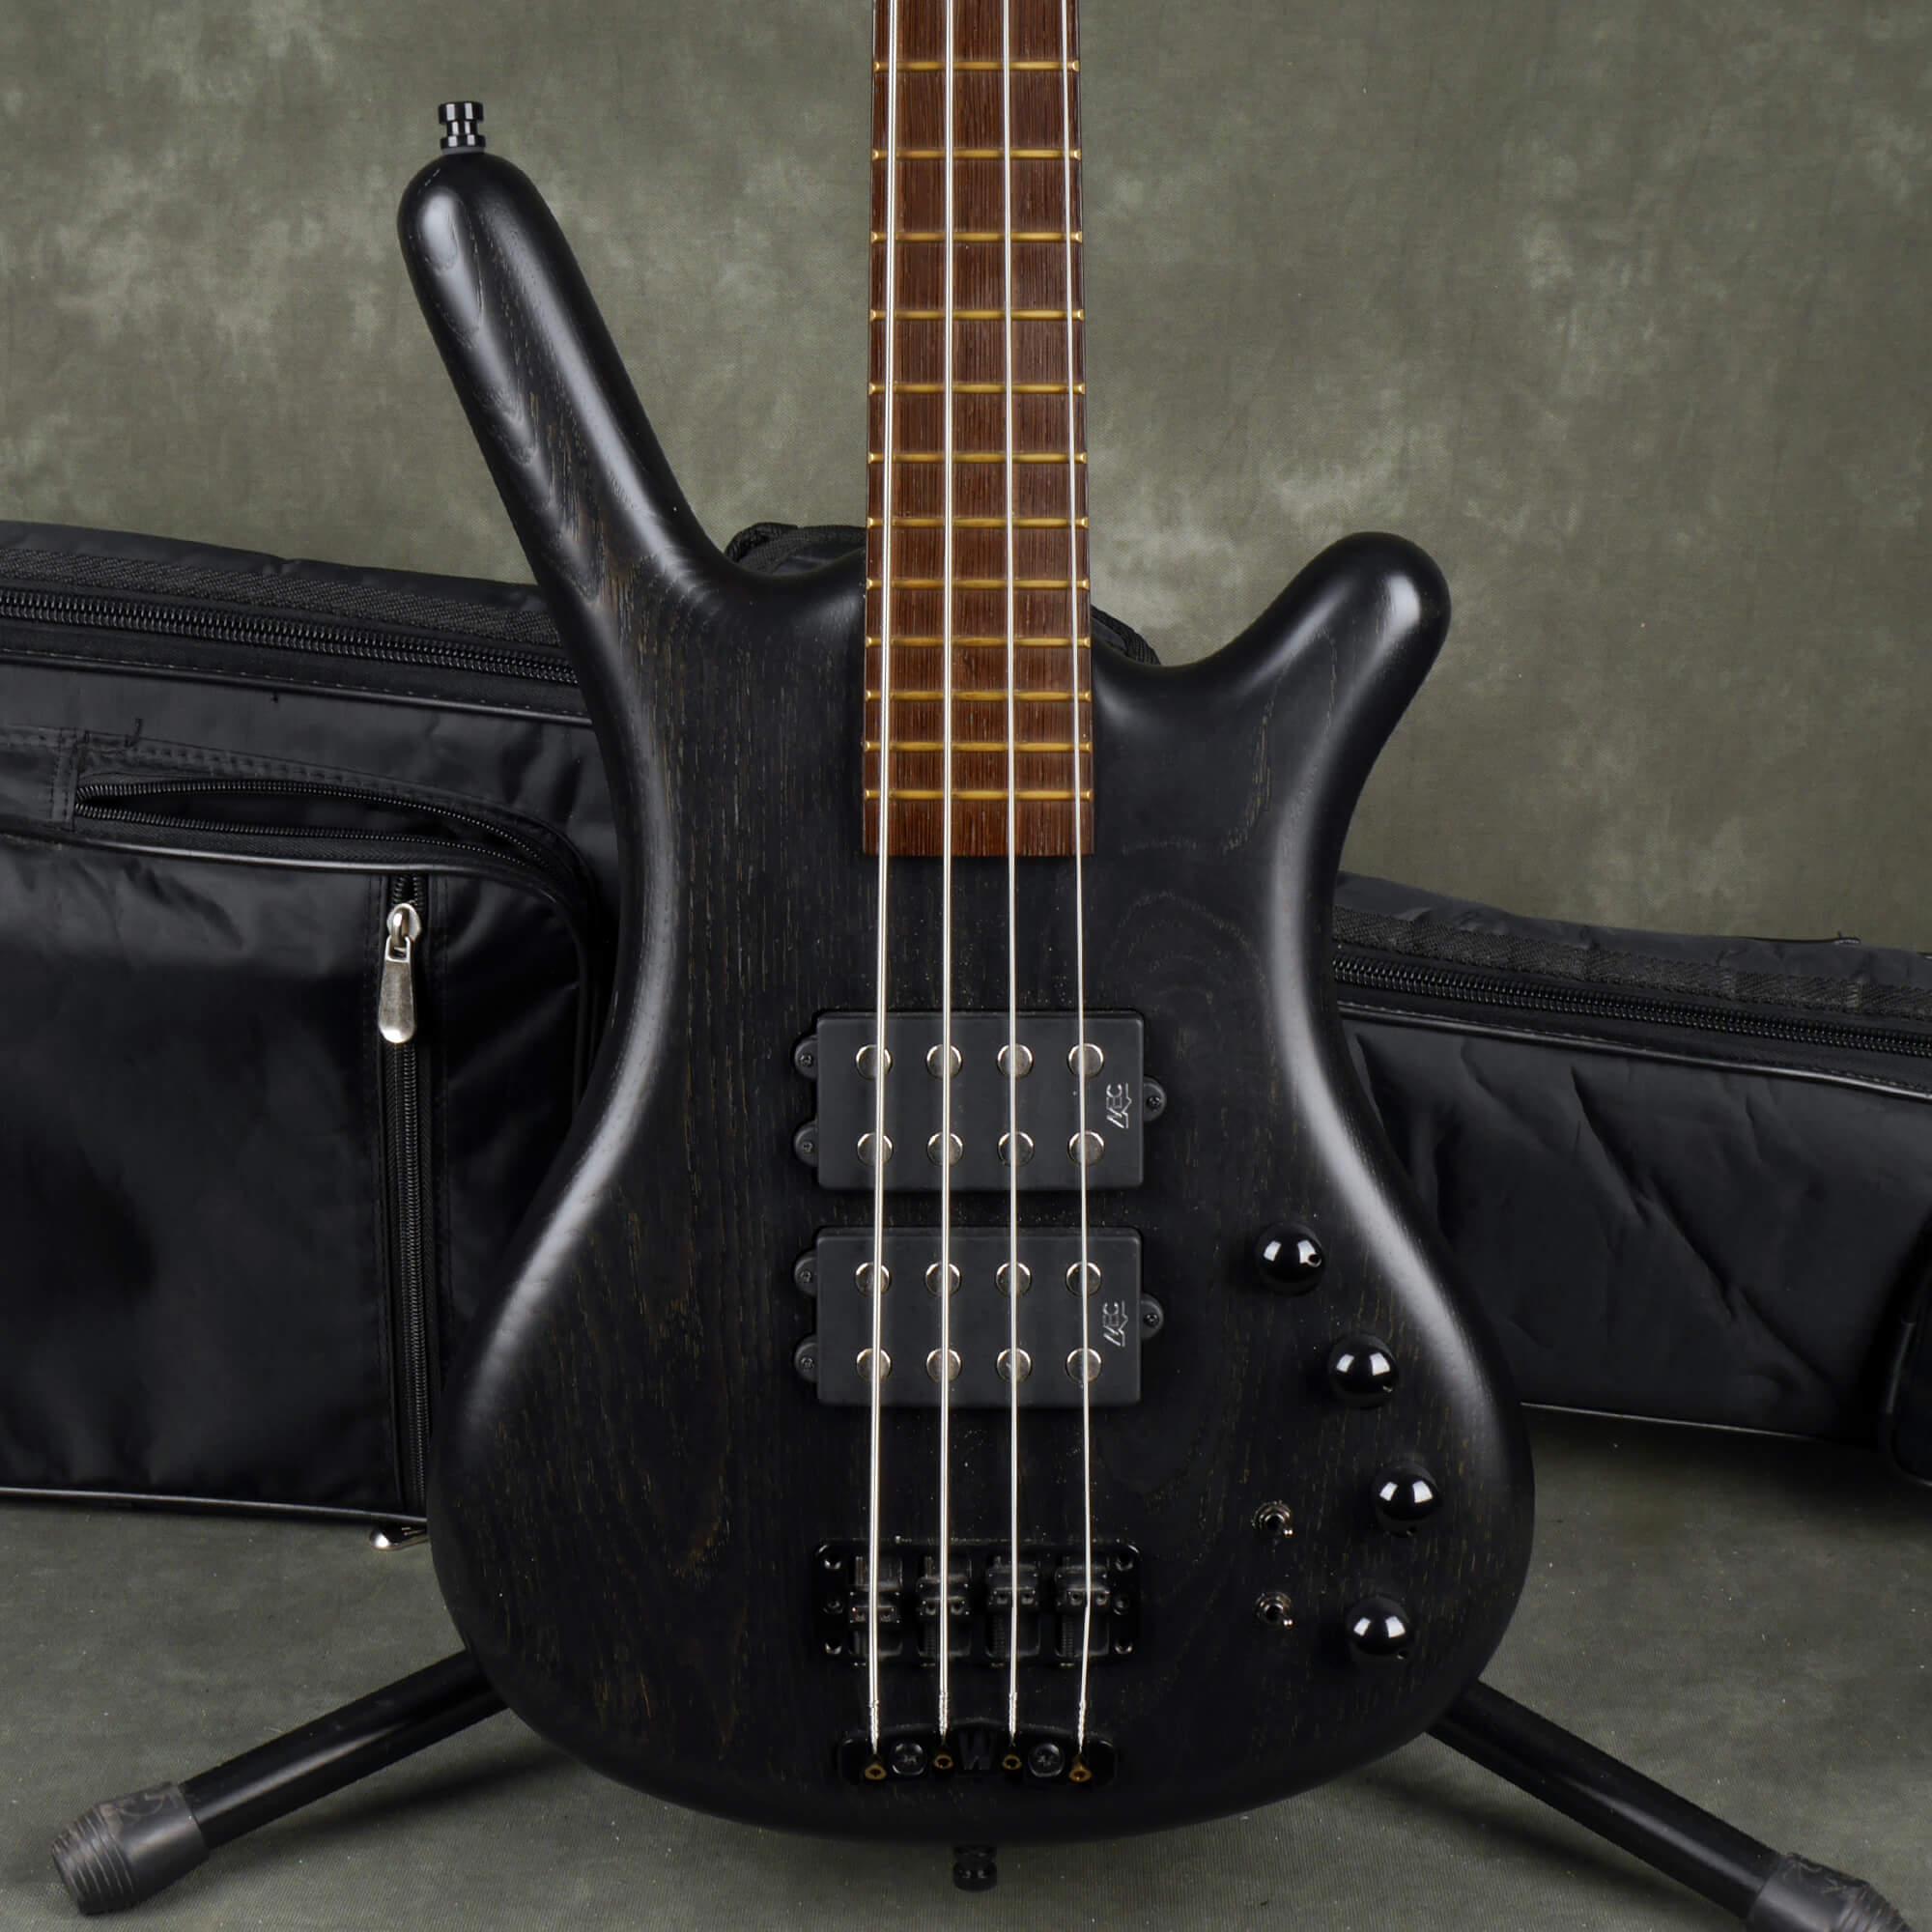 Warwick Double Buck Corvette $$ Bass Guitar - Trans Black w/Gig Bag - 2nd Hand